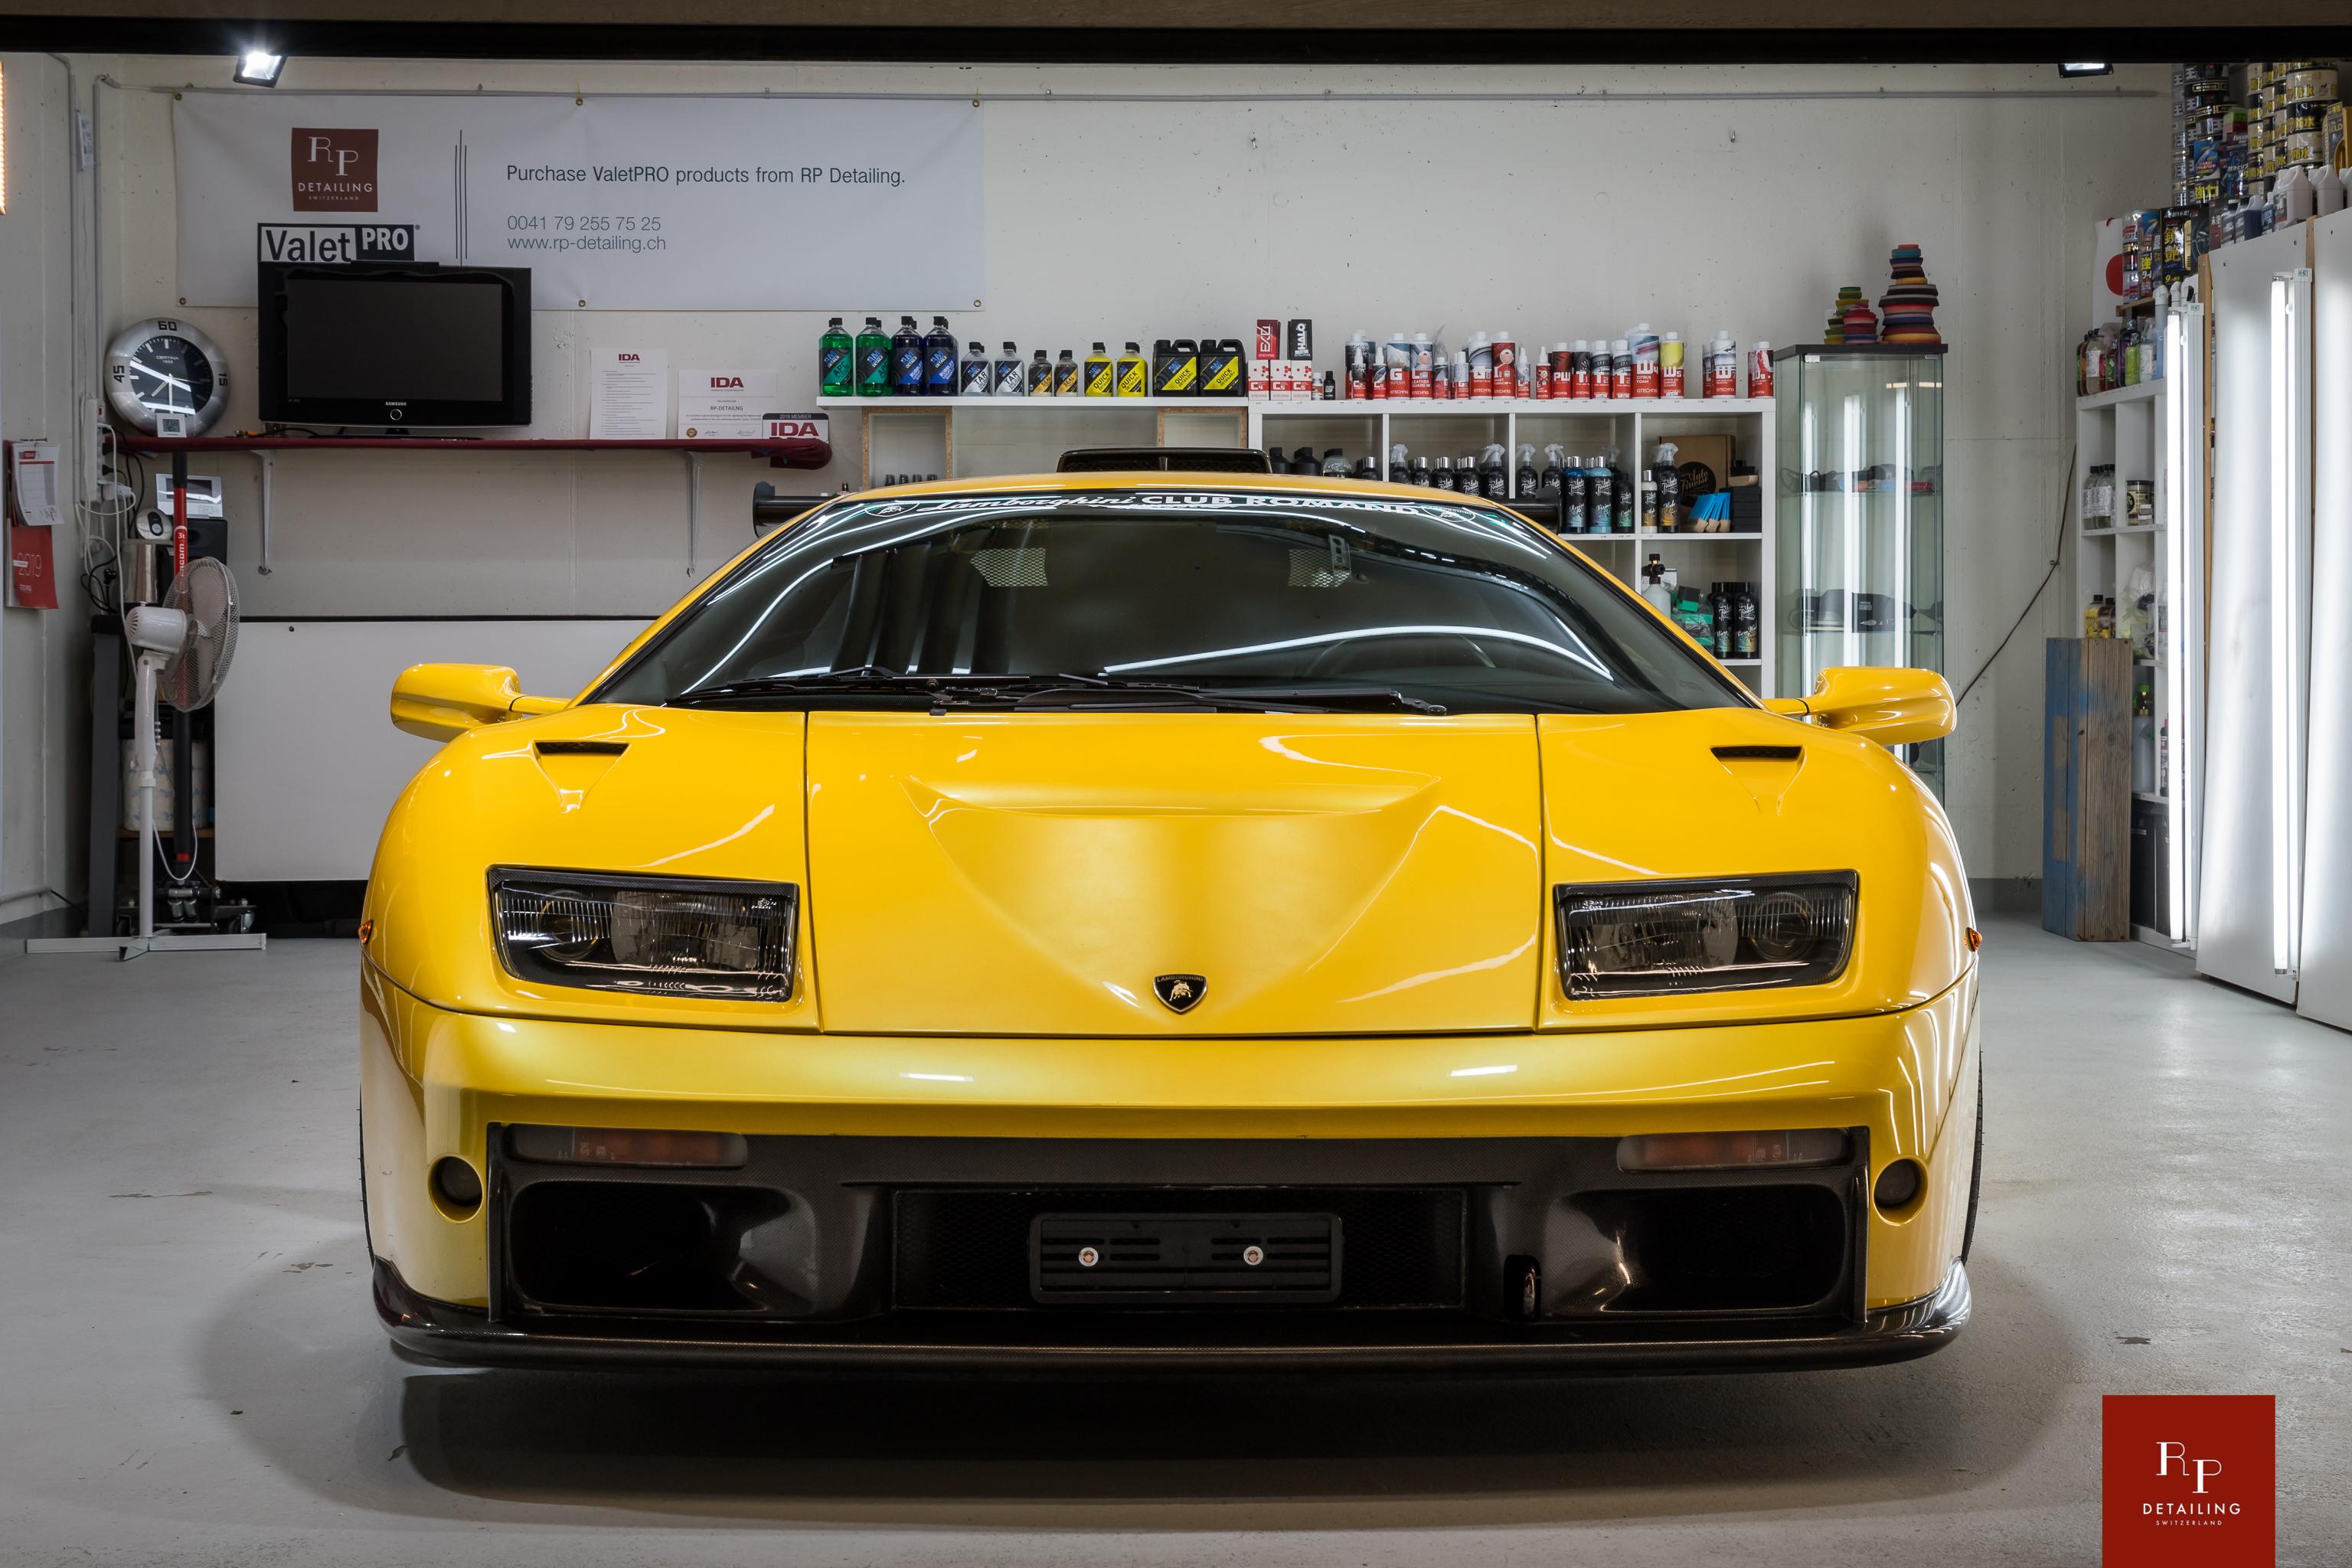 Lamborghini%20Diablo%20GT%20RP%2026.jpg